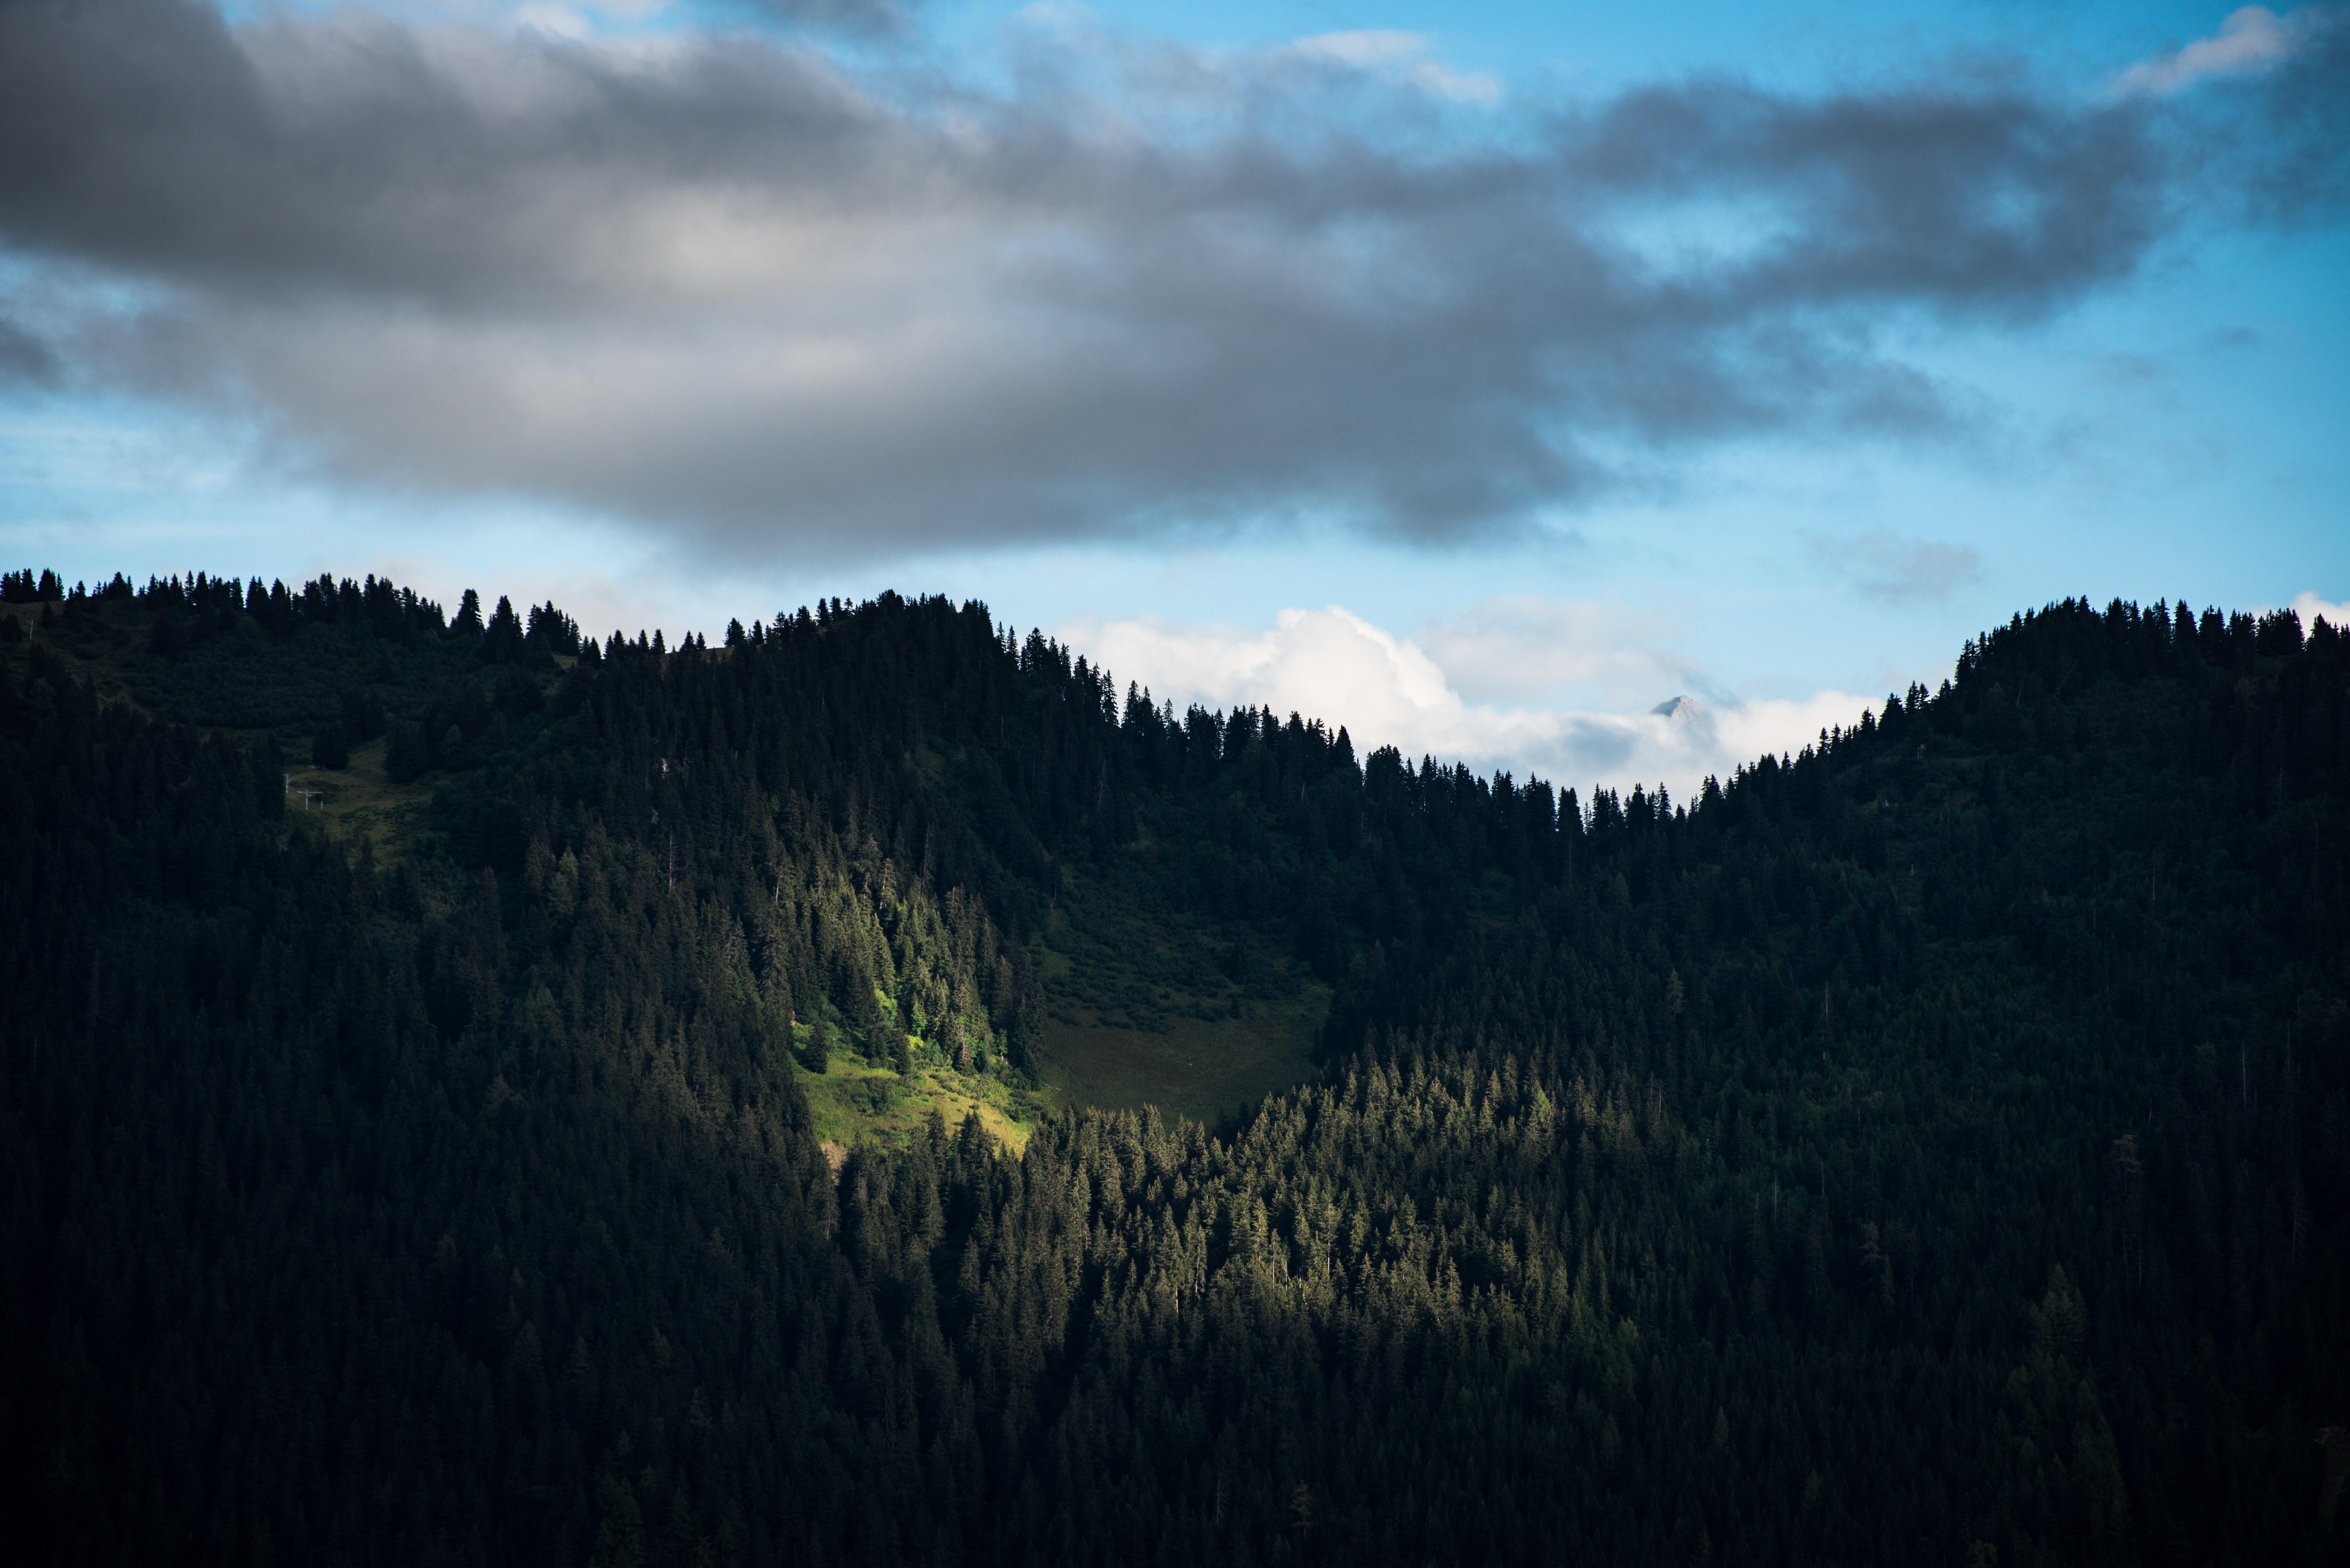 Dark woods on mountain slopes in Leysin